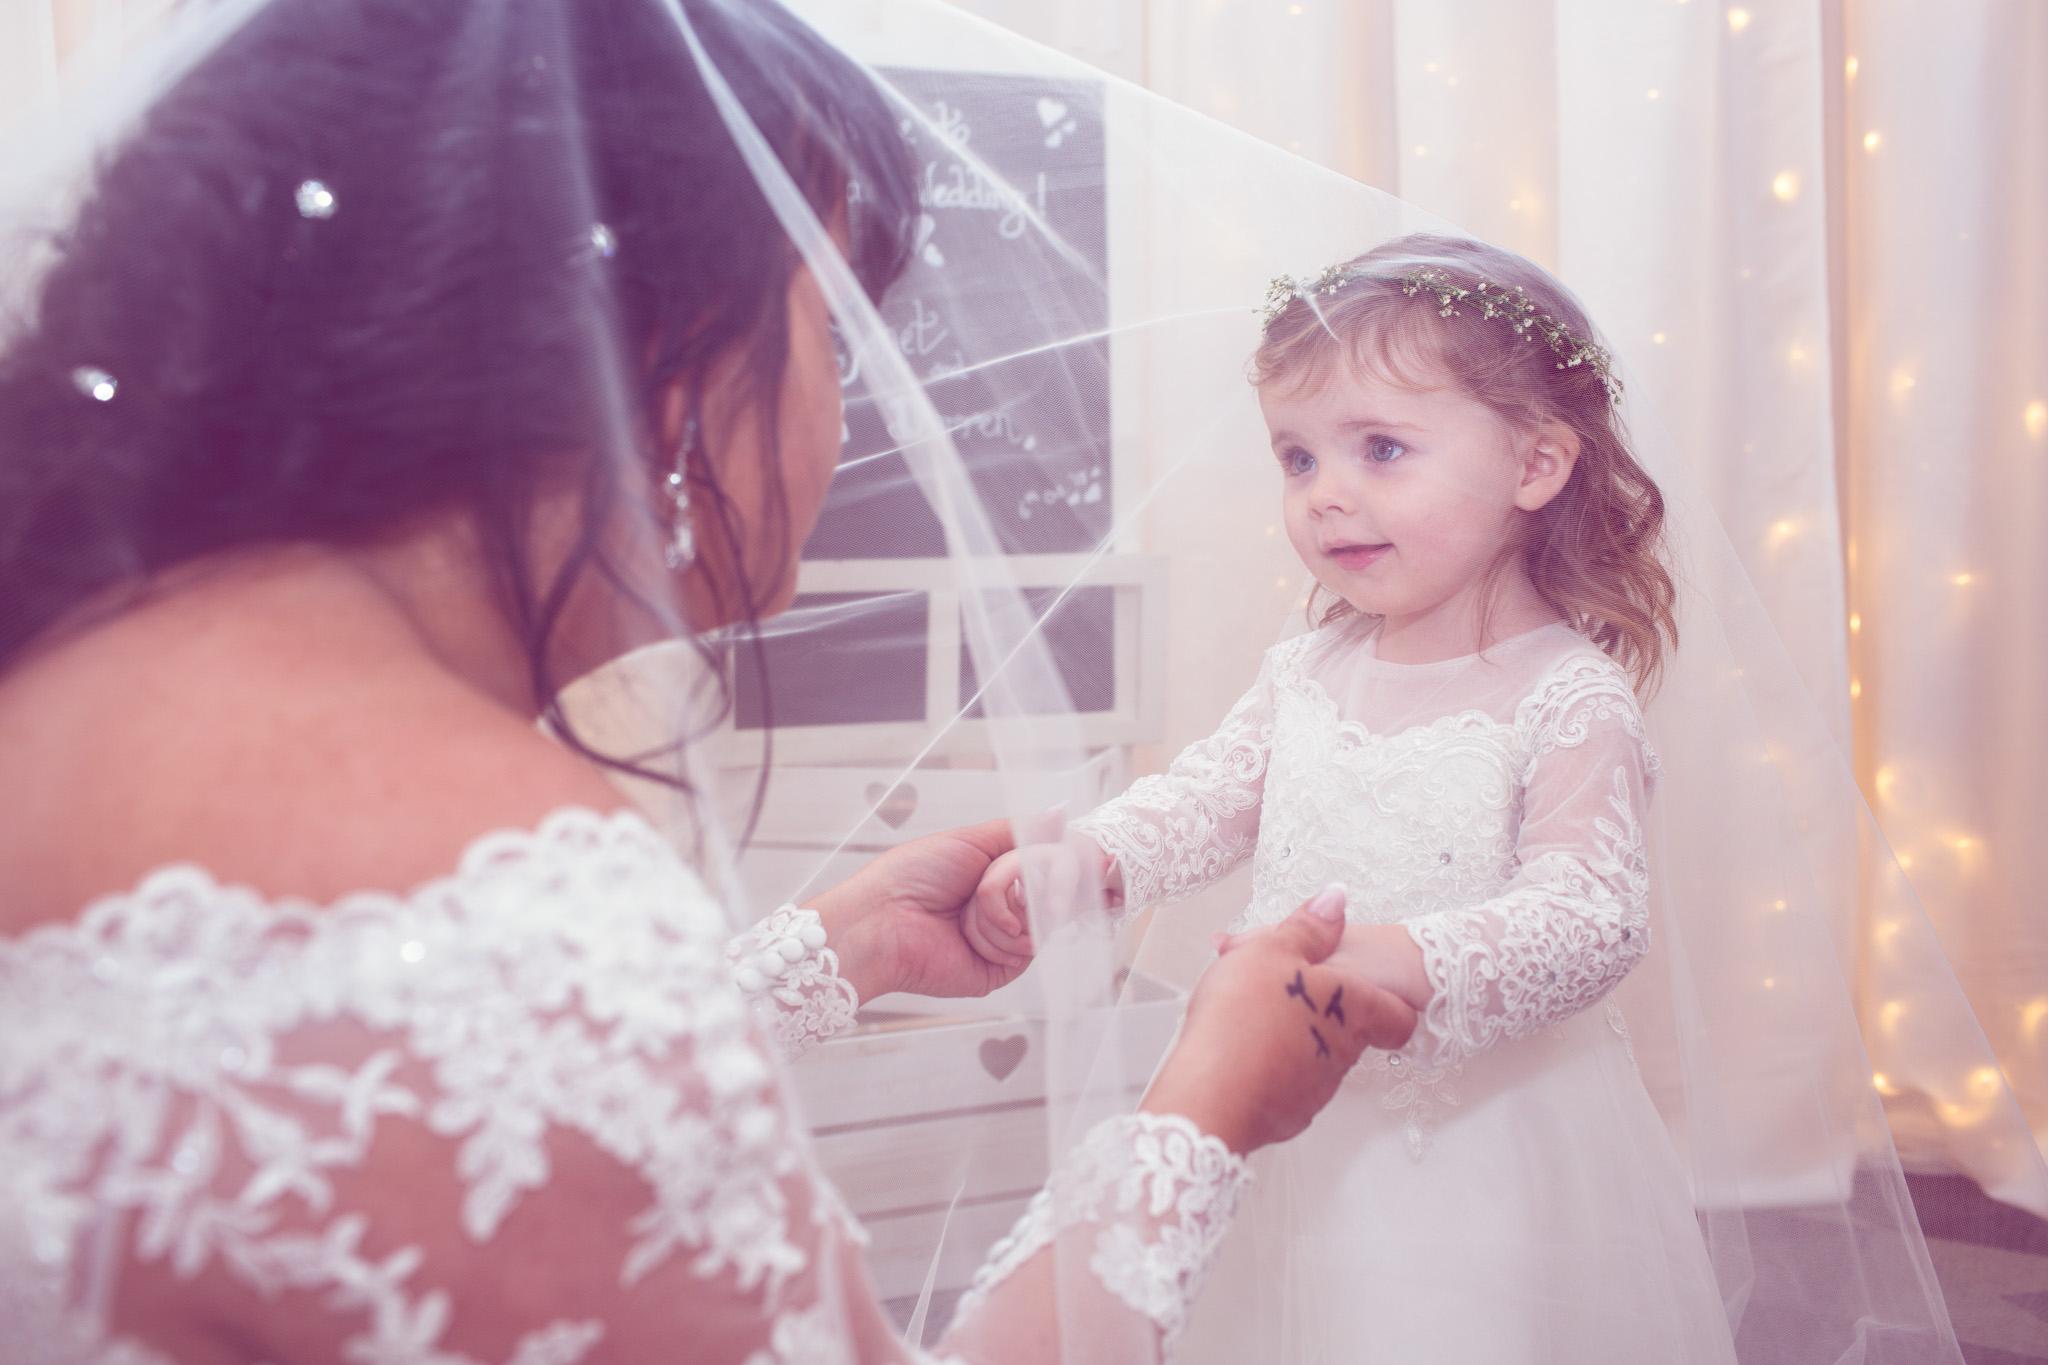 Mark_Barnes_Northern_Ireland_Wedding_Photography_Marine_hotel_ballycastle_Wedding_Photography_Janet&Darren-28.jpg